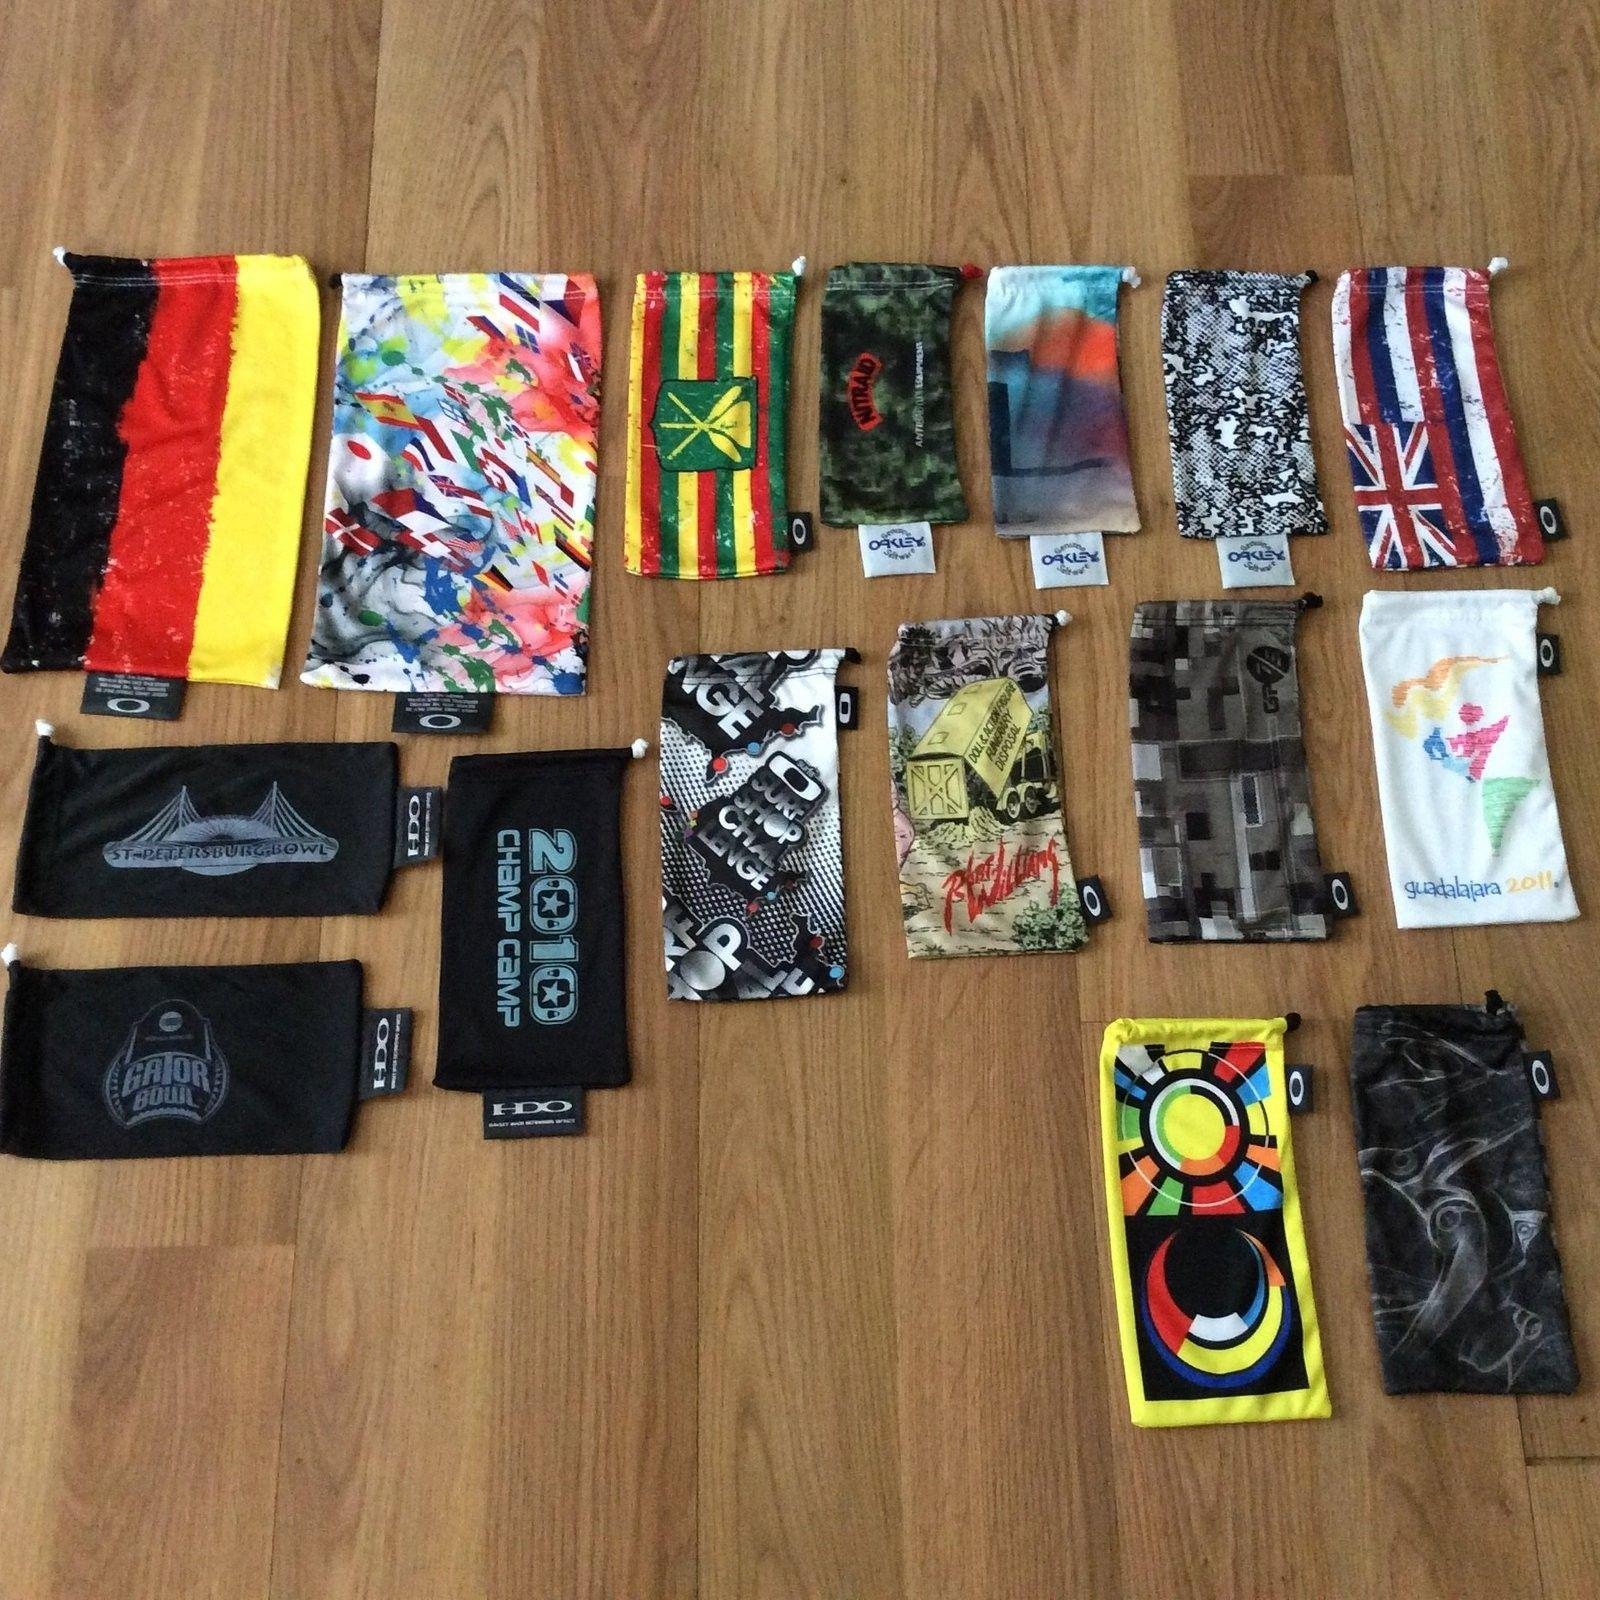 19 Bags $100 Shipped - image.jpg